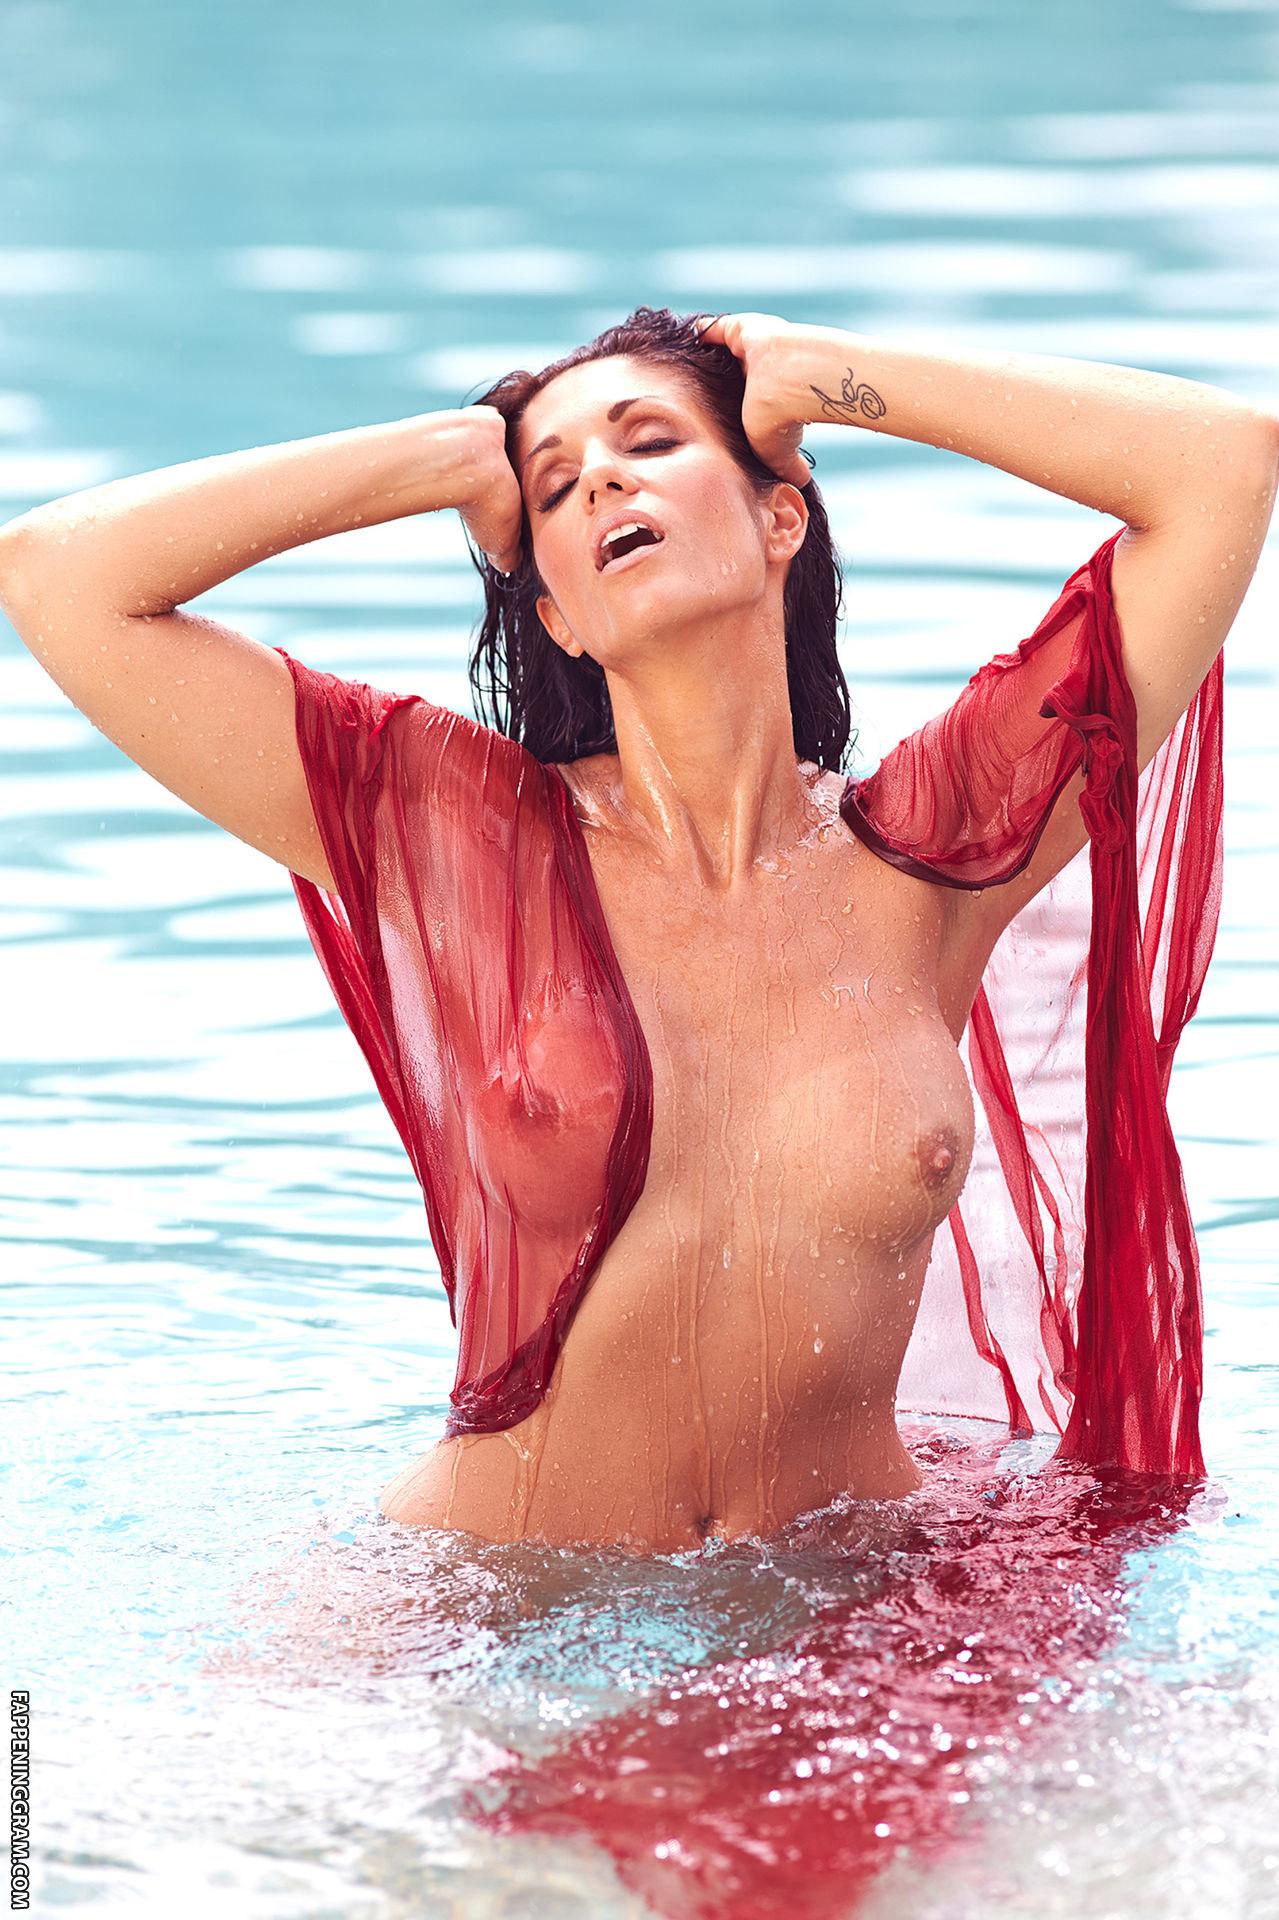 Sarah nackt Plommer 11+ Amazing